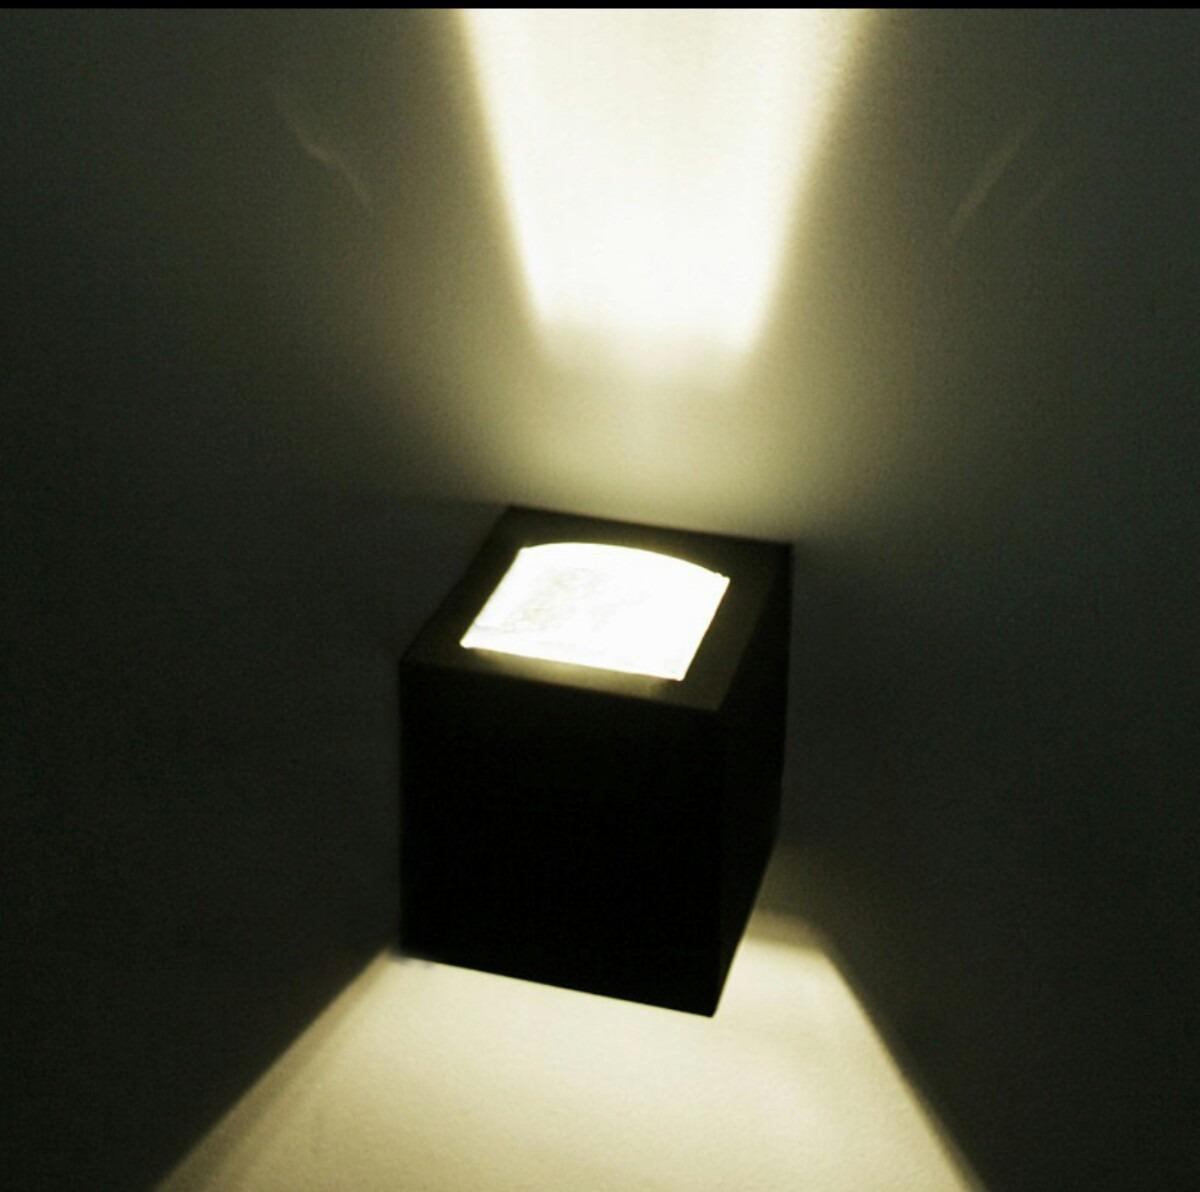 lamparas pared exterior x6 cargando zoom - Lamparas De Pared